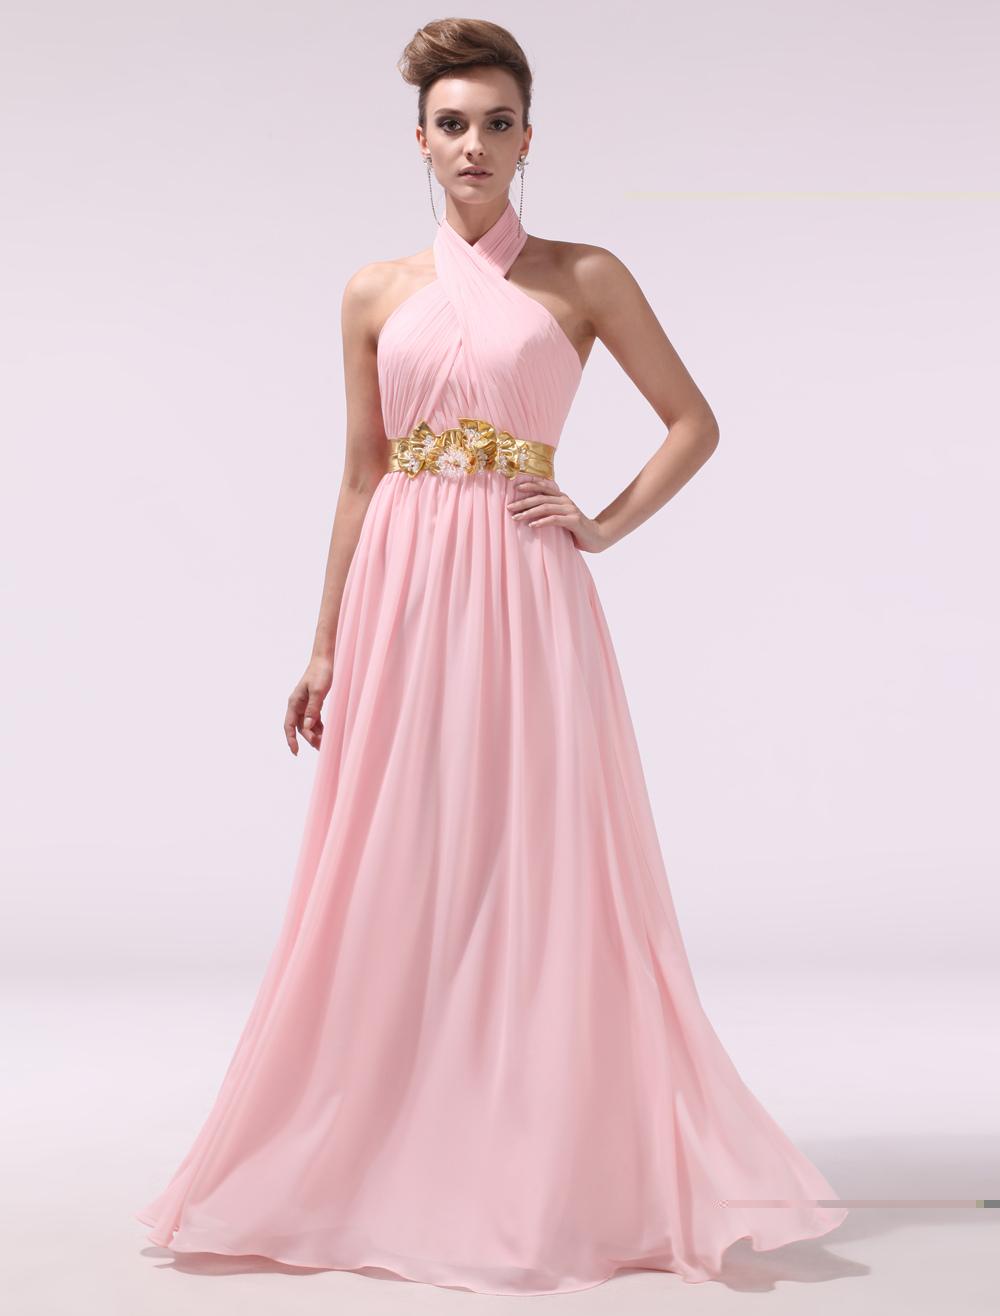 Pink Pleated Halter Sleeveless A-line Chiffon Evening Dress Milanoo (Wedding Evening Dresses) photo